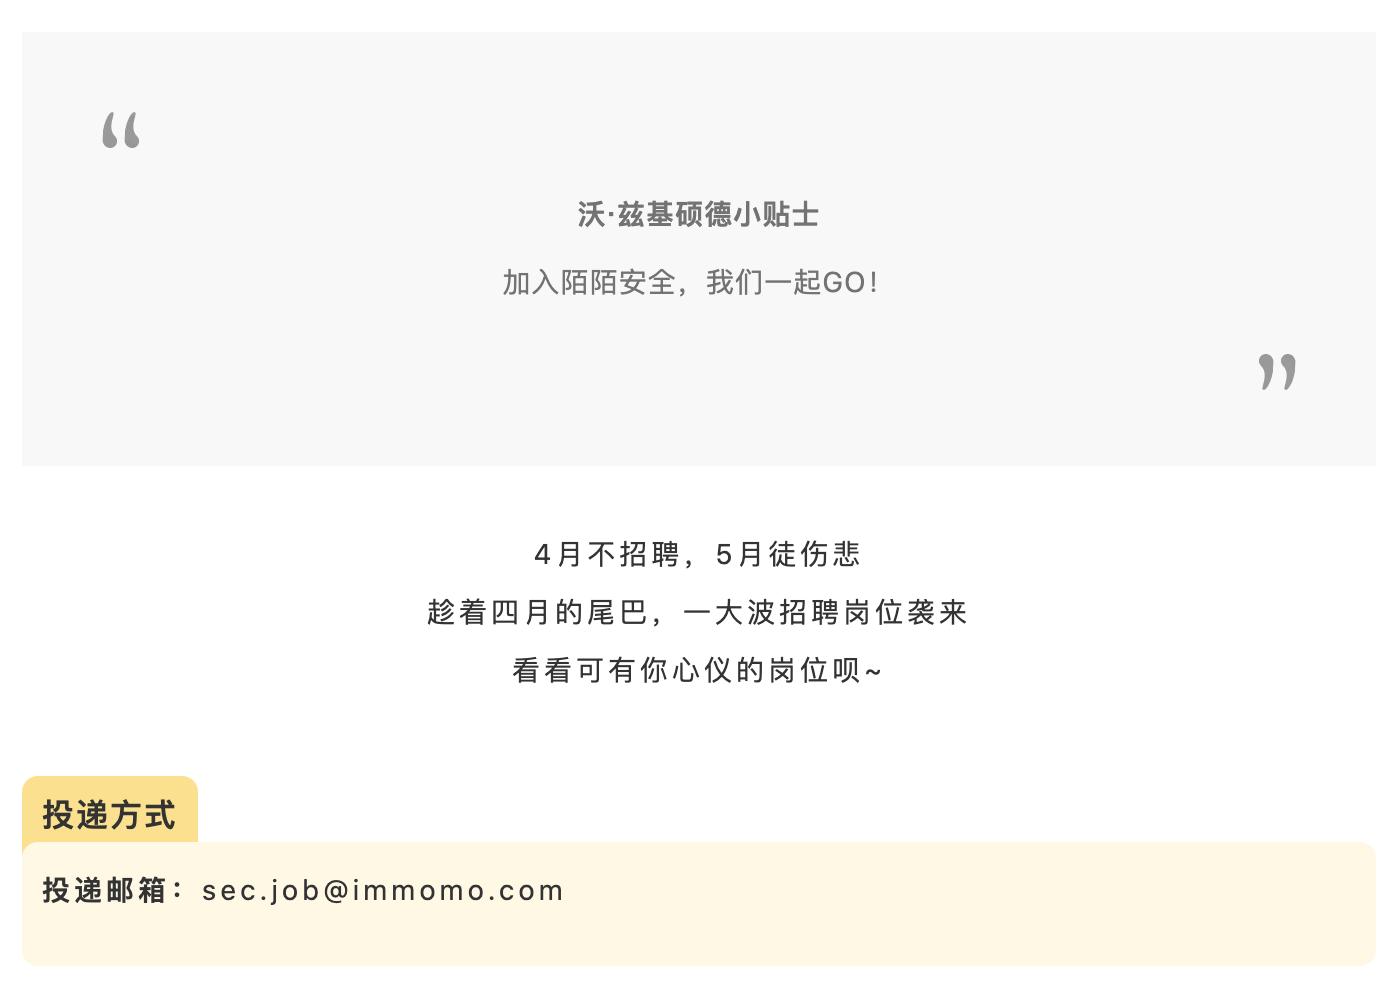 https://momo-mmsrc.oss-cn-hangzhou.aliyuncs.com/img-62b53247-bae8-3d20-a2b0-7f8a844045ef.png